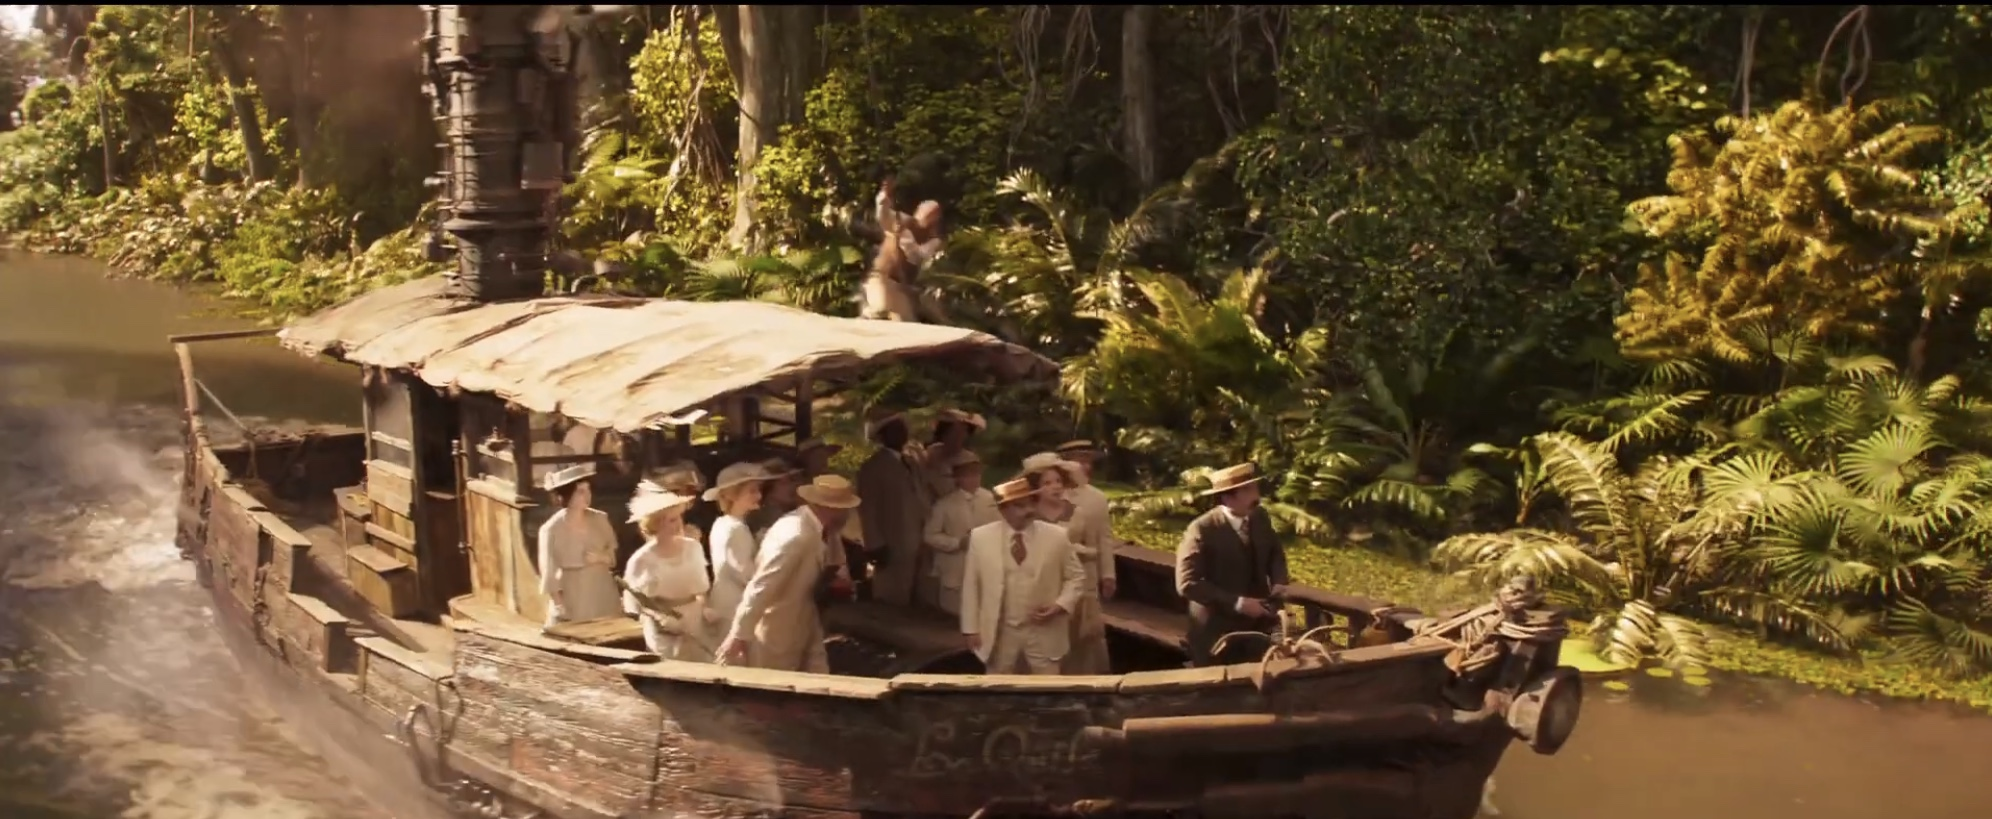 Brent Reviews Disney's Jungle Cruise